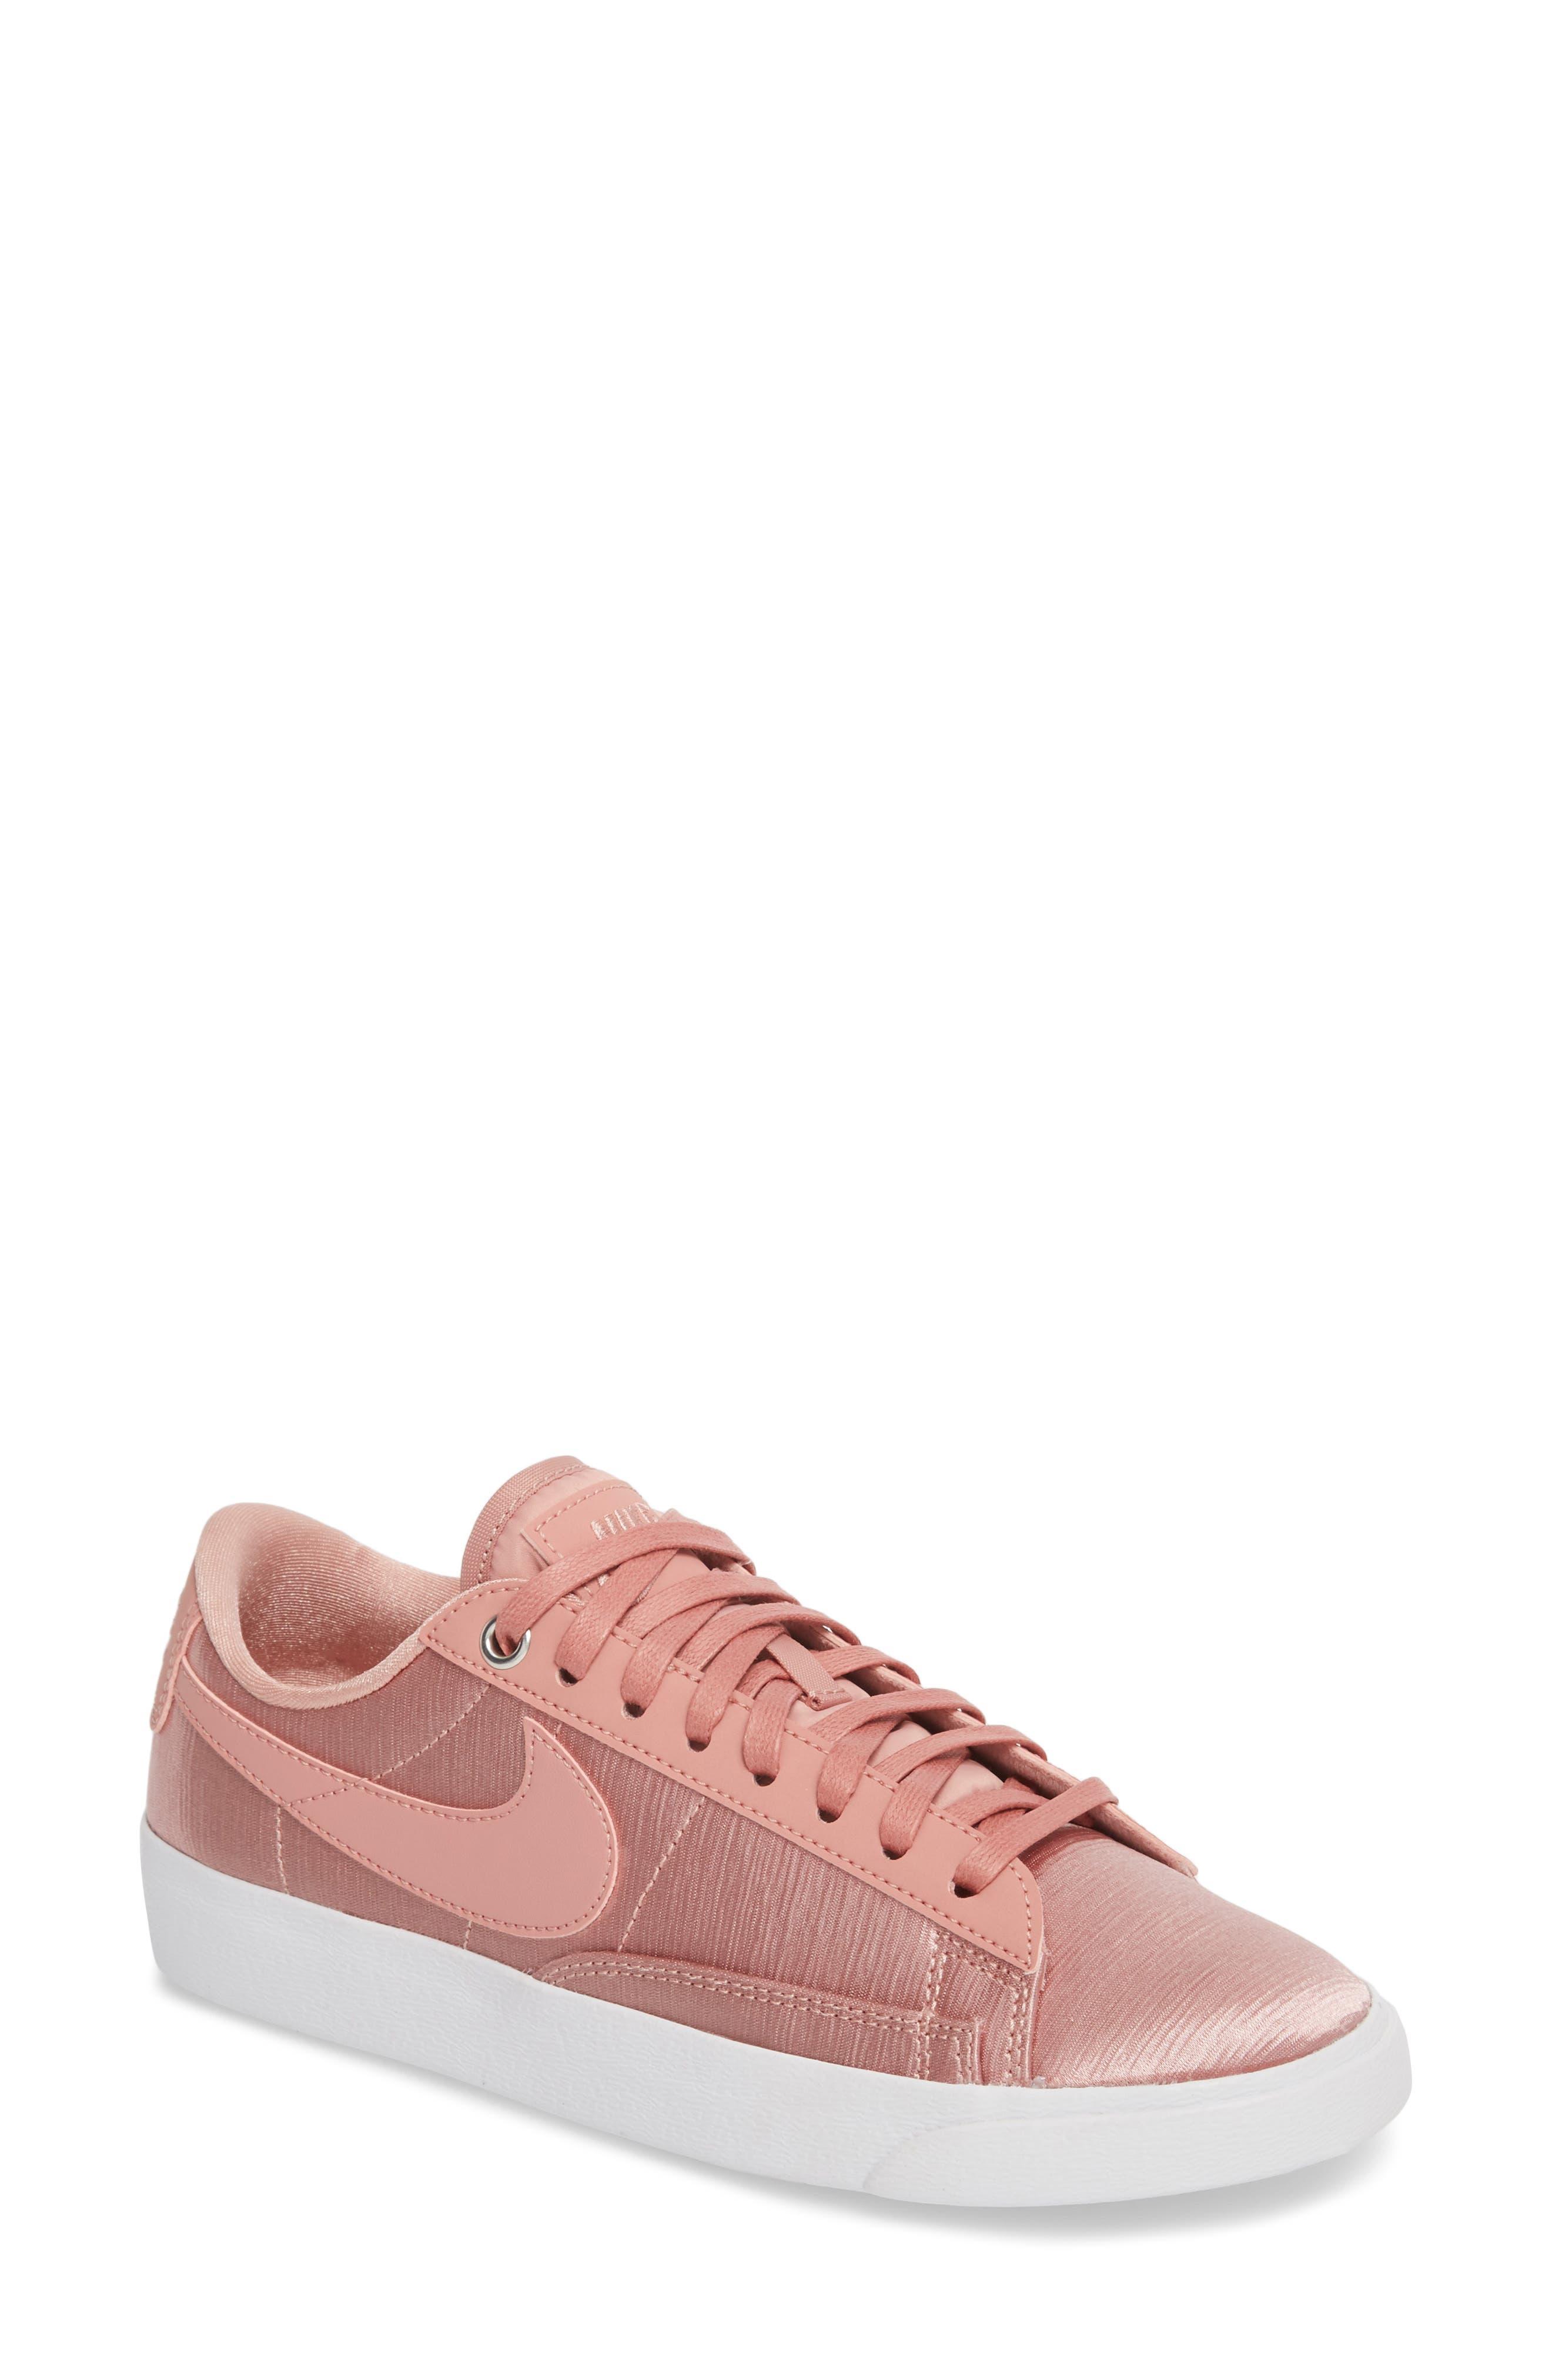 Blazer Low SE Sneaker,                         Main,                         color, RUST PINK/ RUST PINK